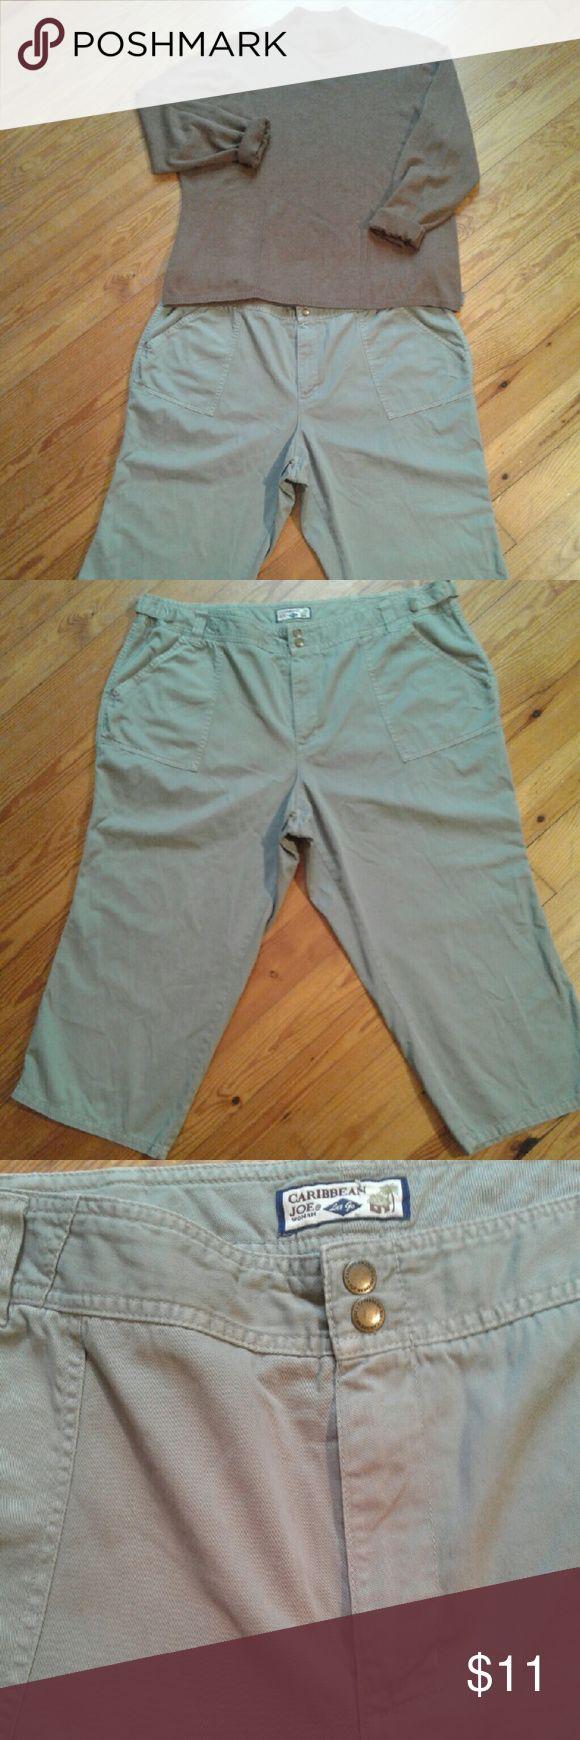 PLUS SIZE  Caribbean Joe Khaki  Green Capri Pants Plus Size Caribbean Joe Khaki  Green Capri Pants . 100% cotton, 2 front & 2 back pockets. Size 20W. Good condition. Sold as is. Caribbean Joe  Pants